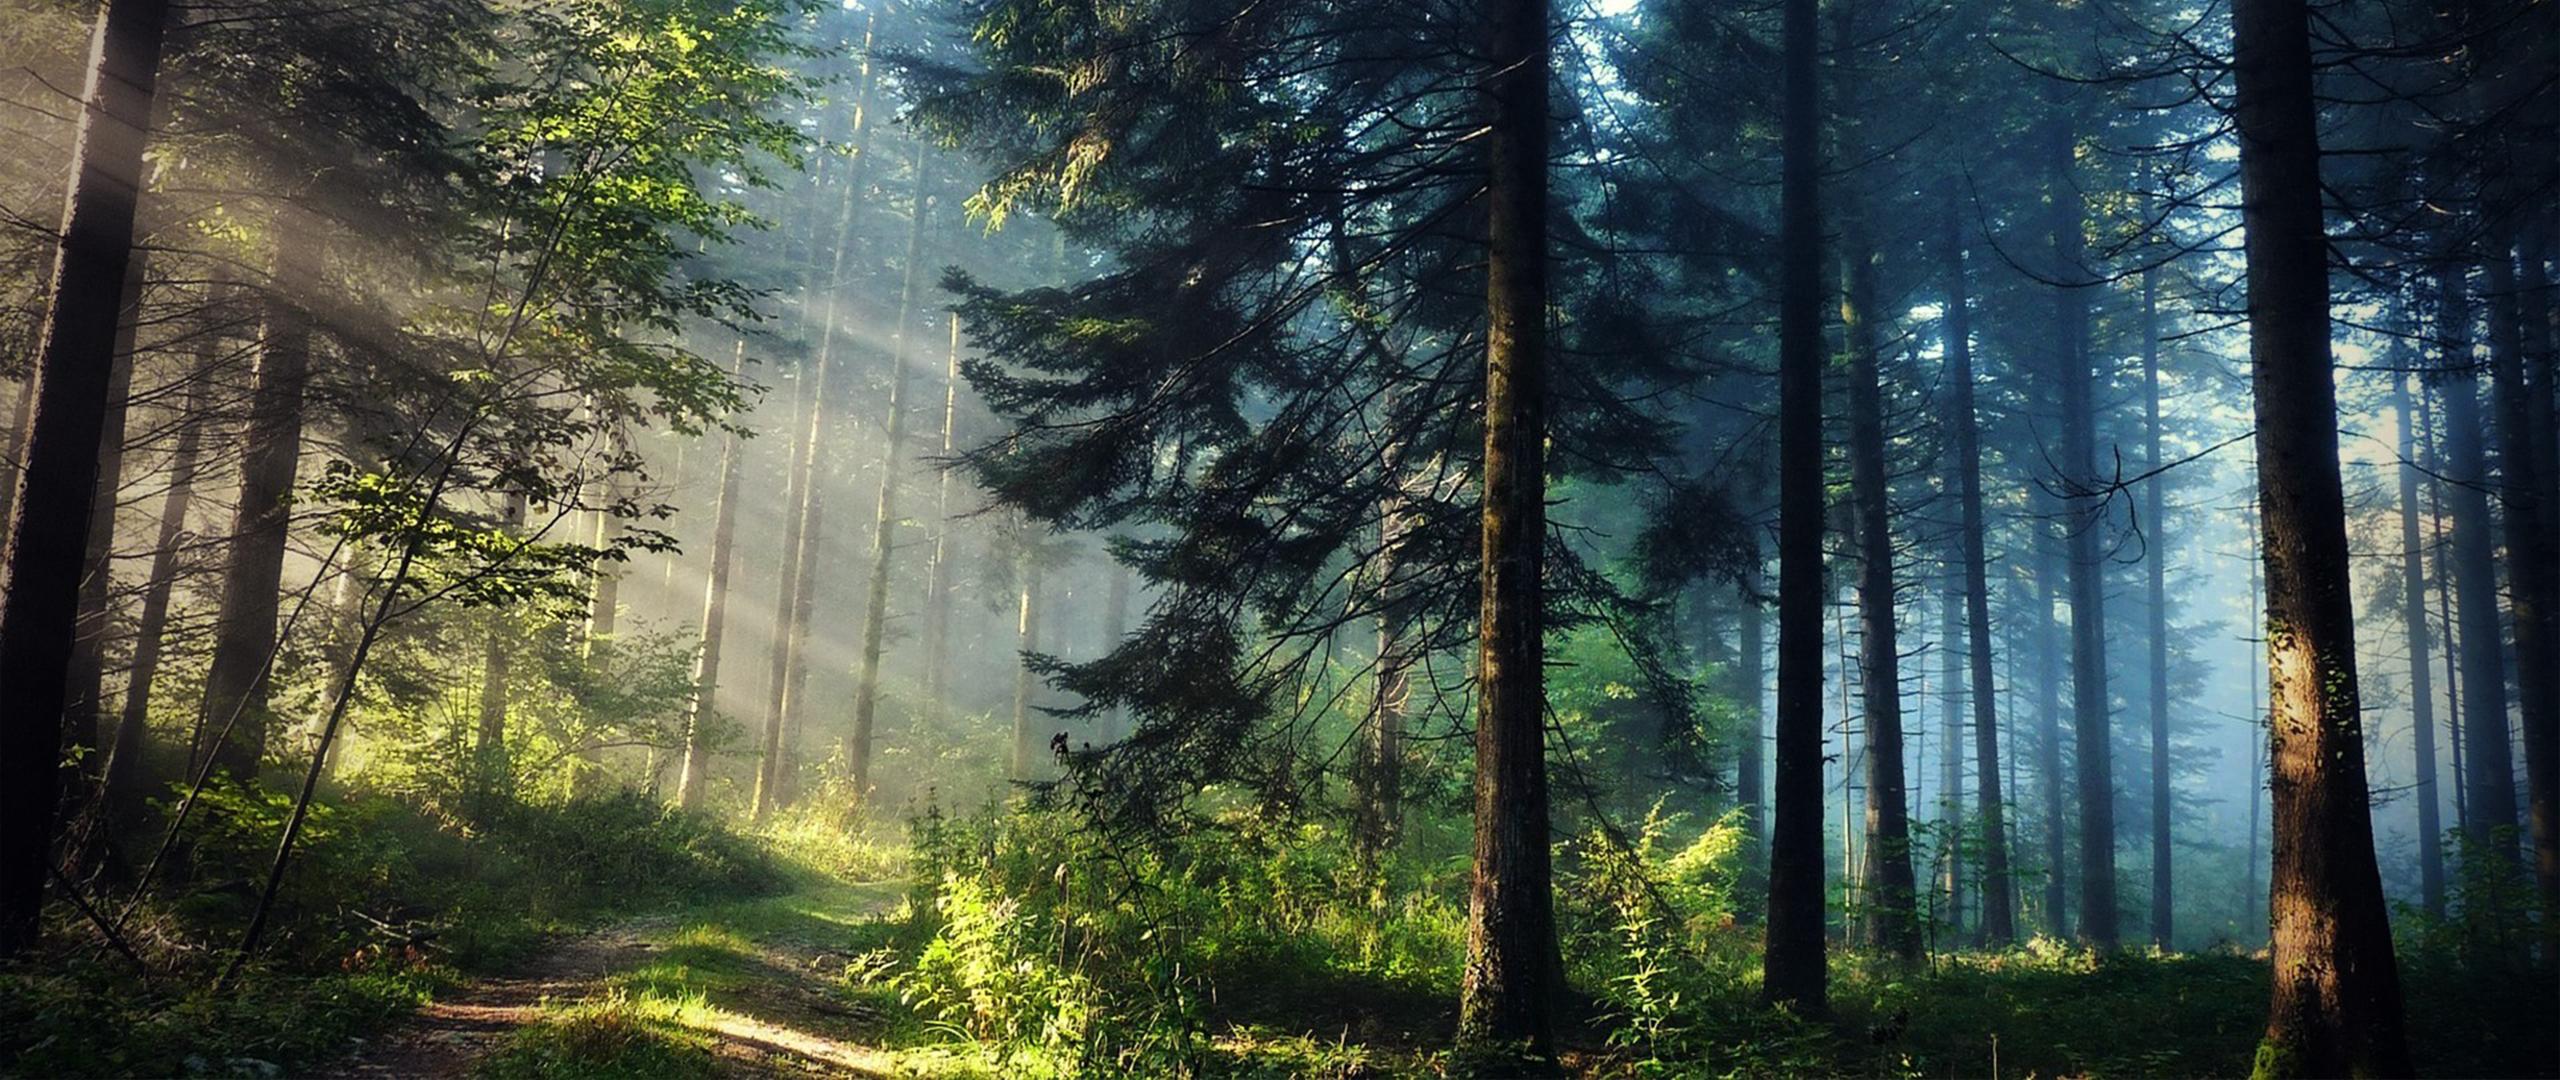 Wallpaper Sunlight Trees Nature Photography Green